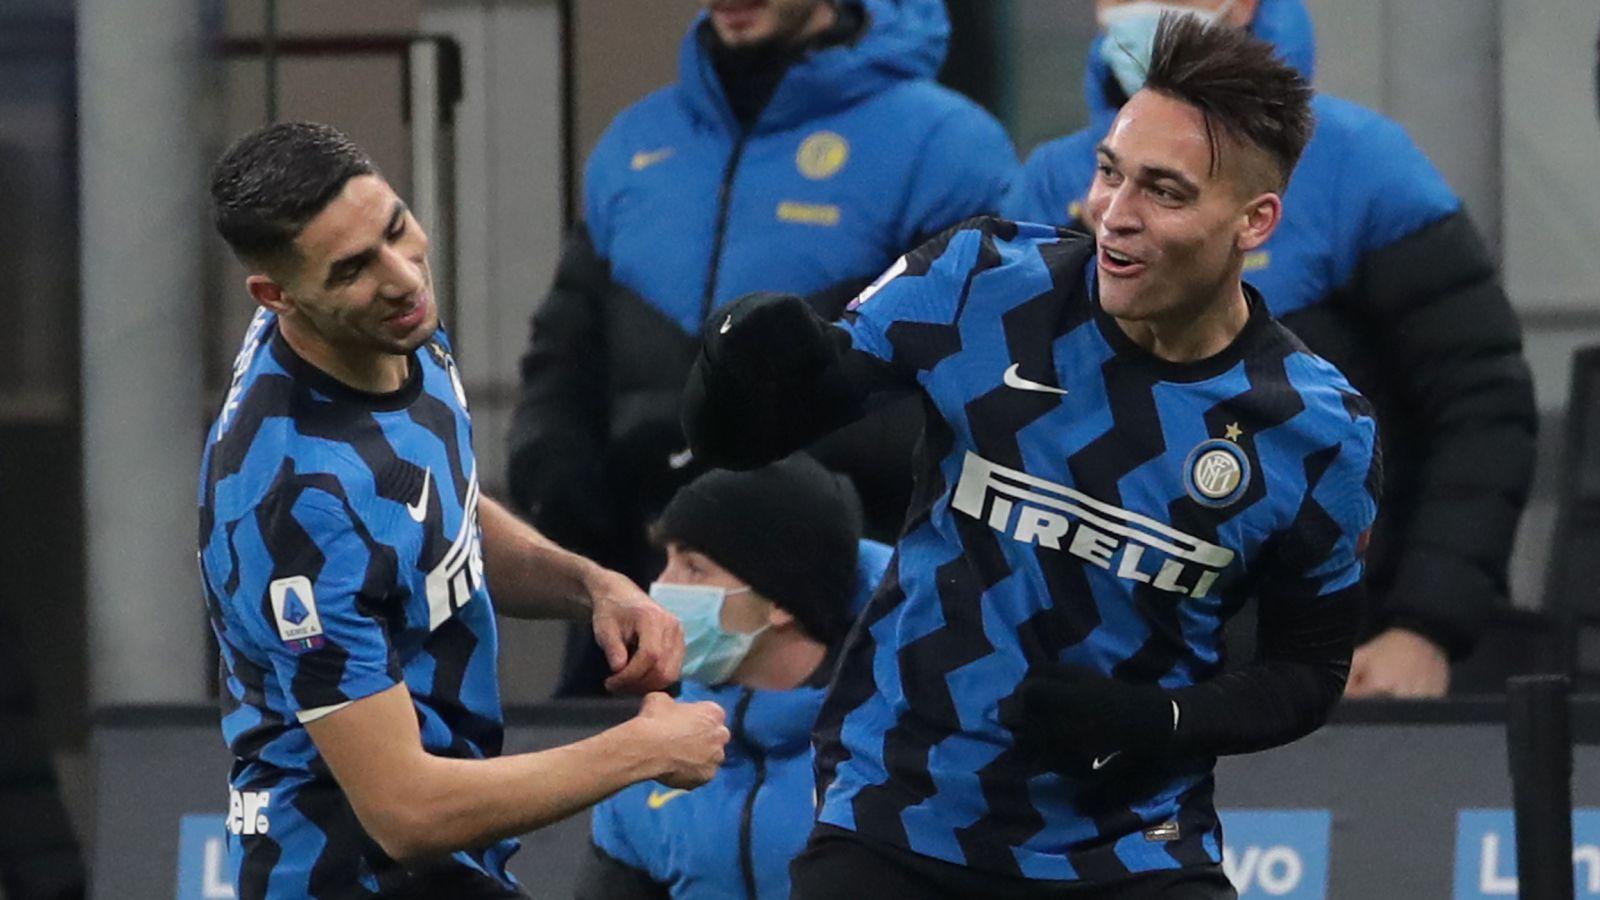 Lautaro Martinez dan Achraf Hakimi berselebrasi dalam laga Inter Milan vs Lazio. (foto: twitter.com/Inter)